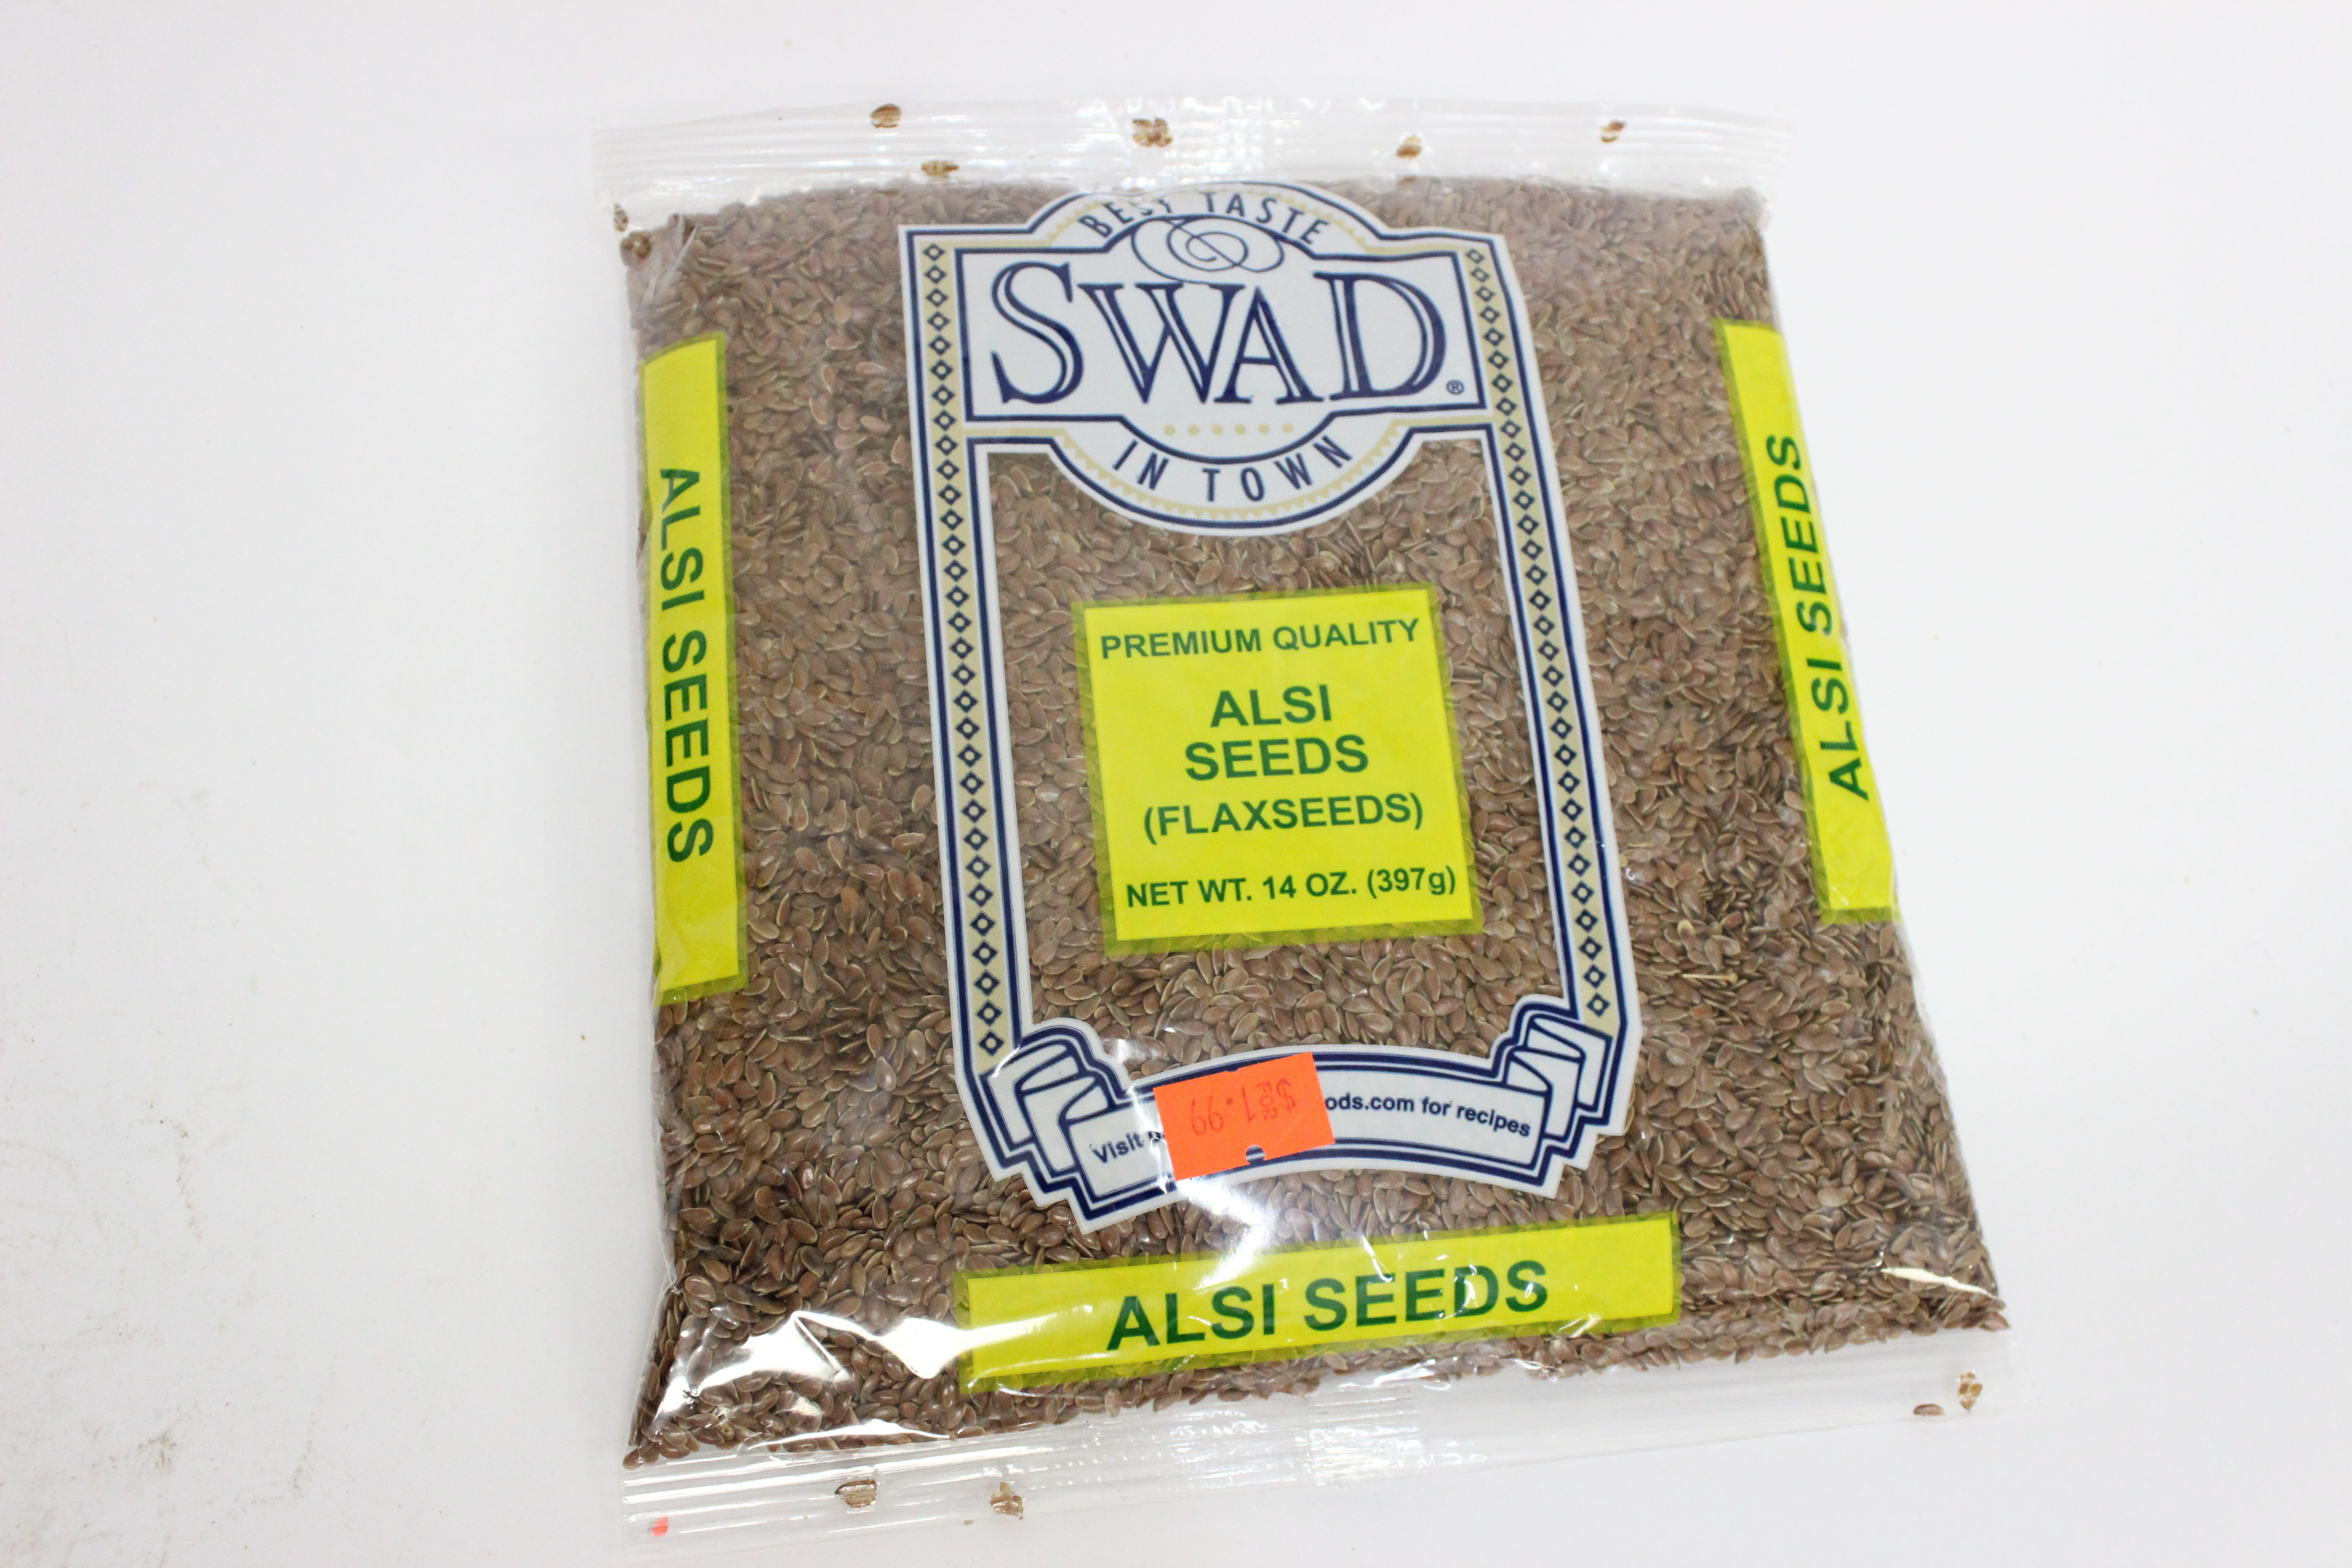 Alsi Seeds (Flaxseeds) 14oz